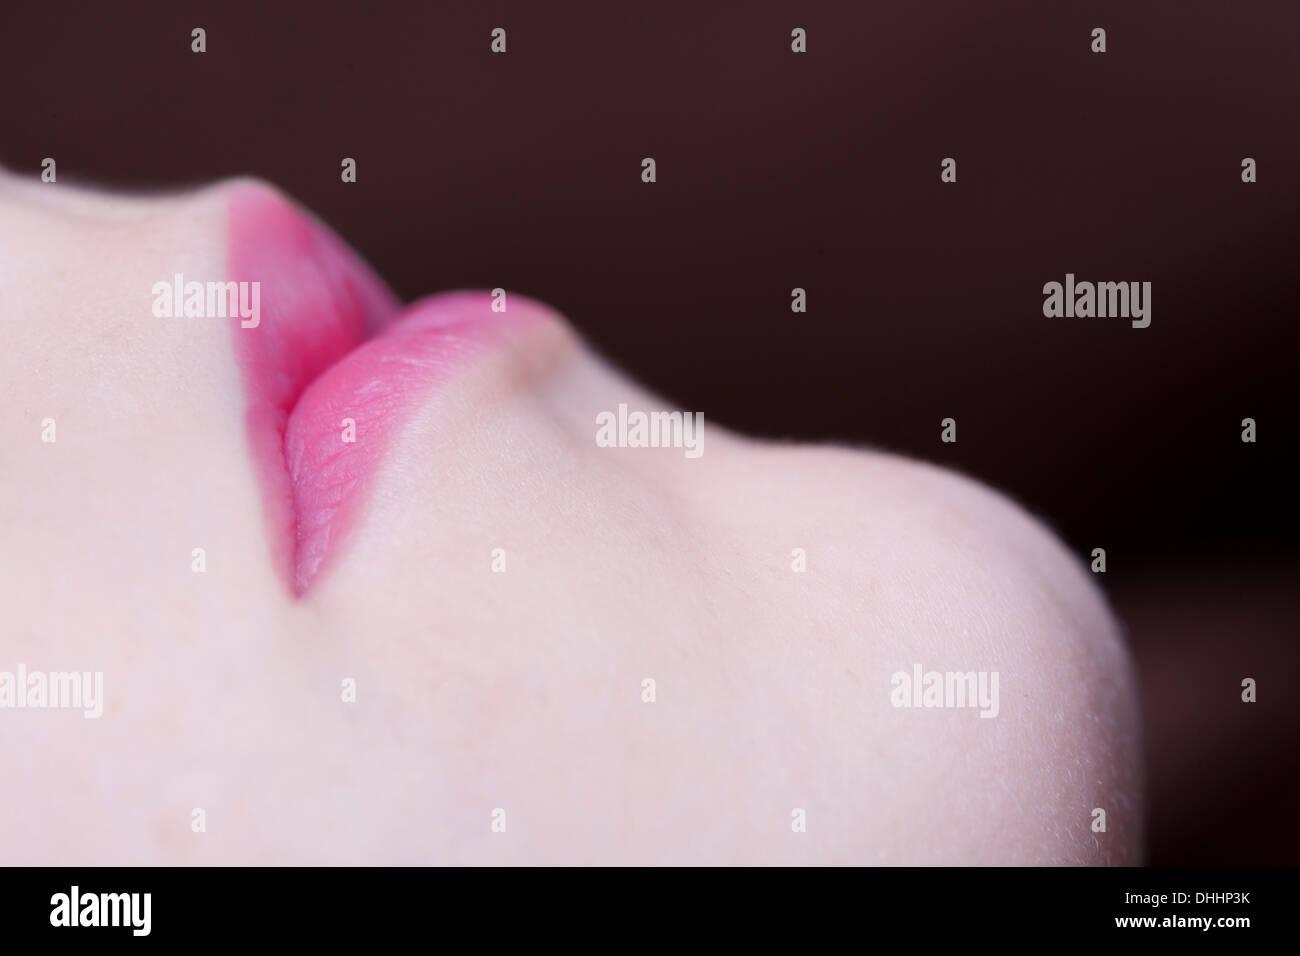 Pink Heart Lips - Stock Image